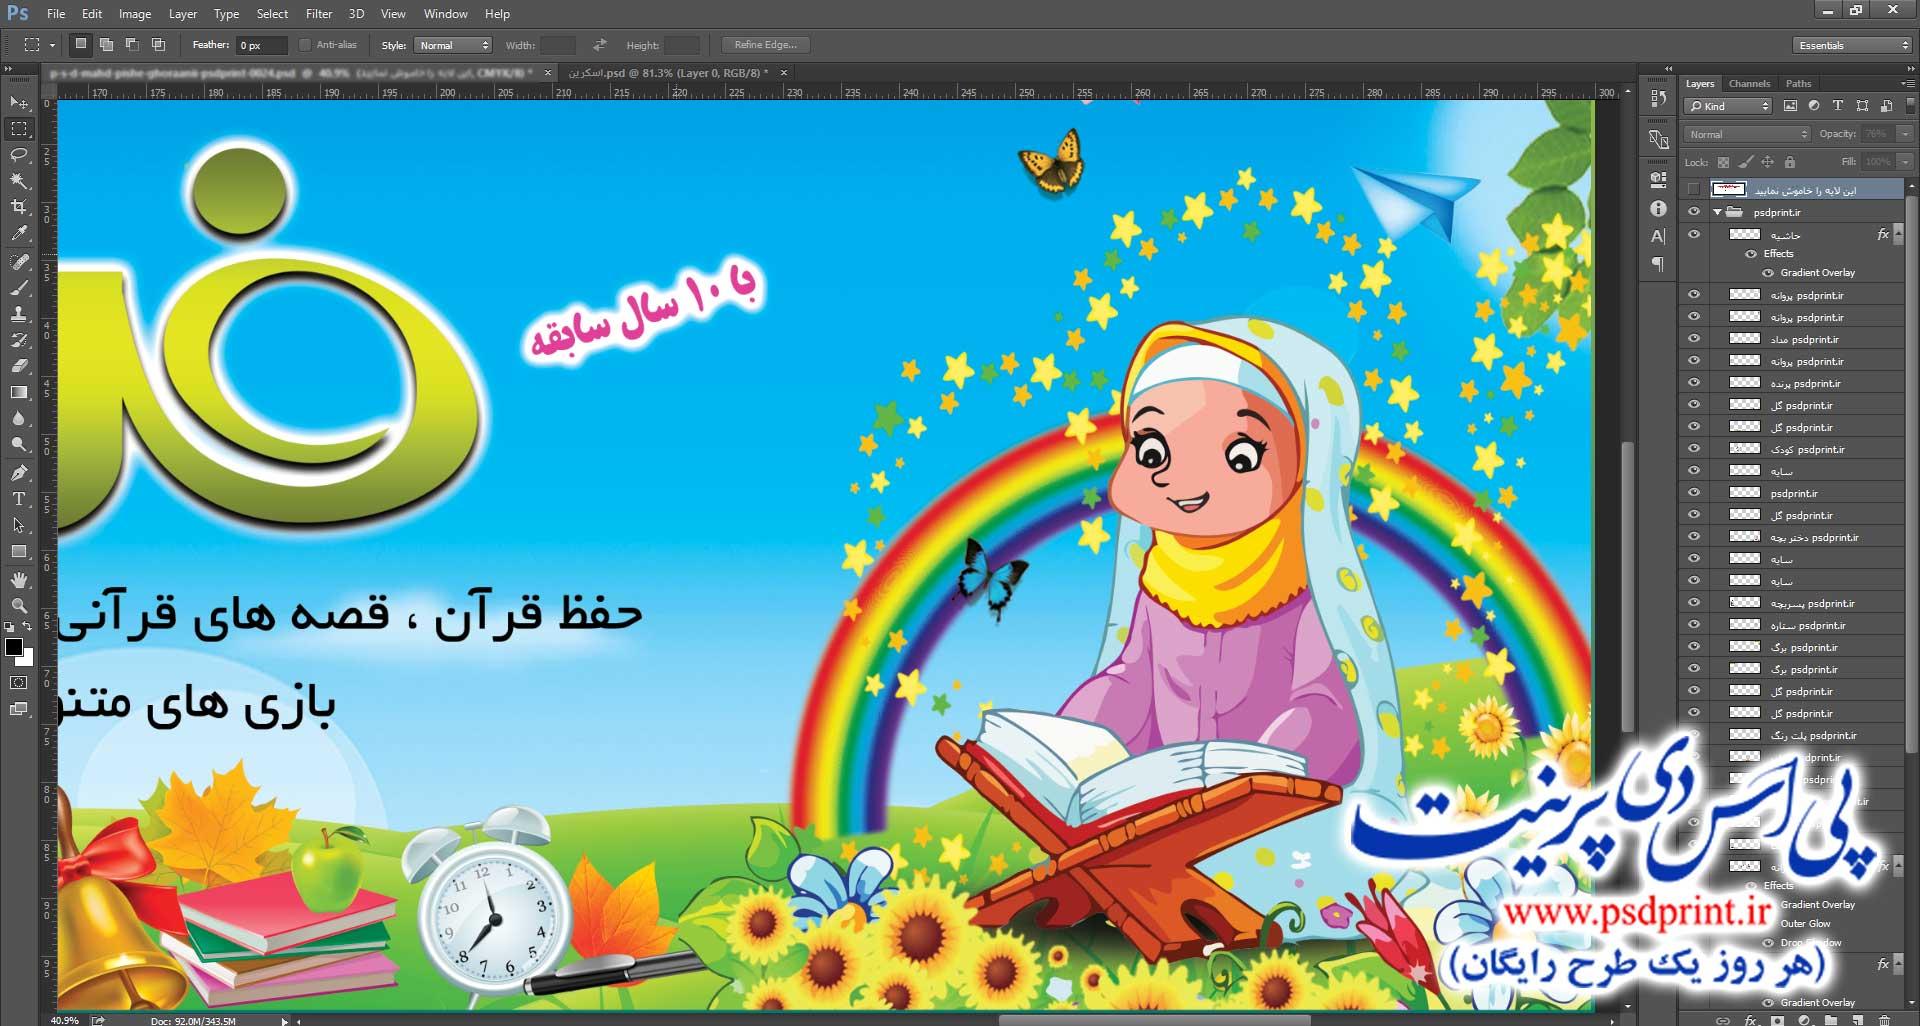 بنر مهد کودک و پیش دبستانی قرآنی